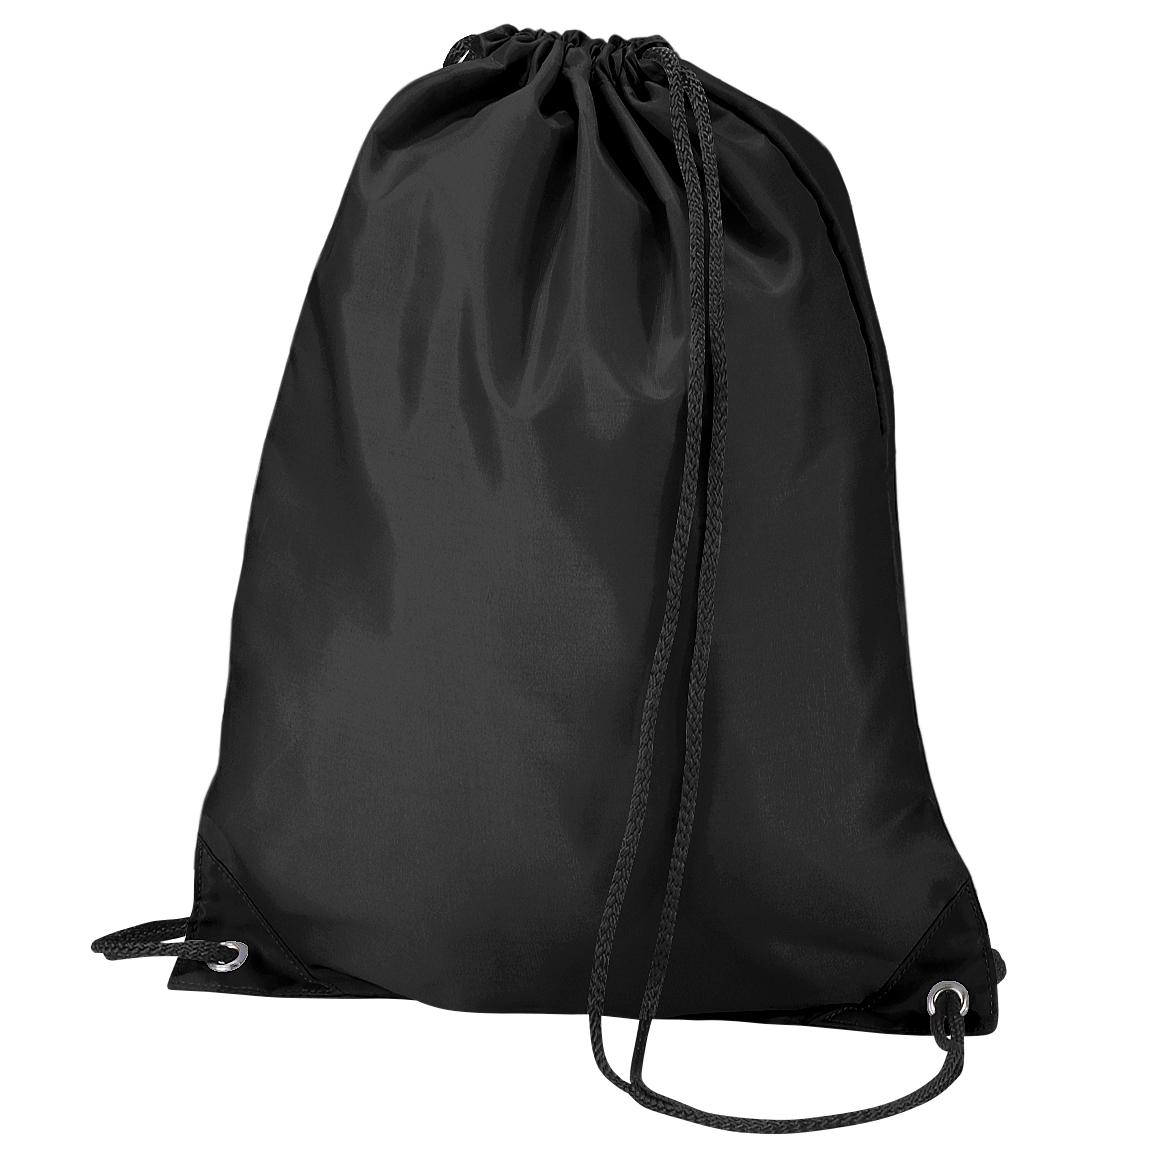 Quadra Gymsac Shoulder Carry Bag - 7 Litres (One Size) (Black)